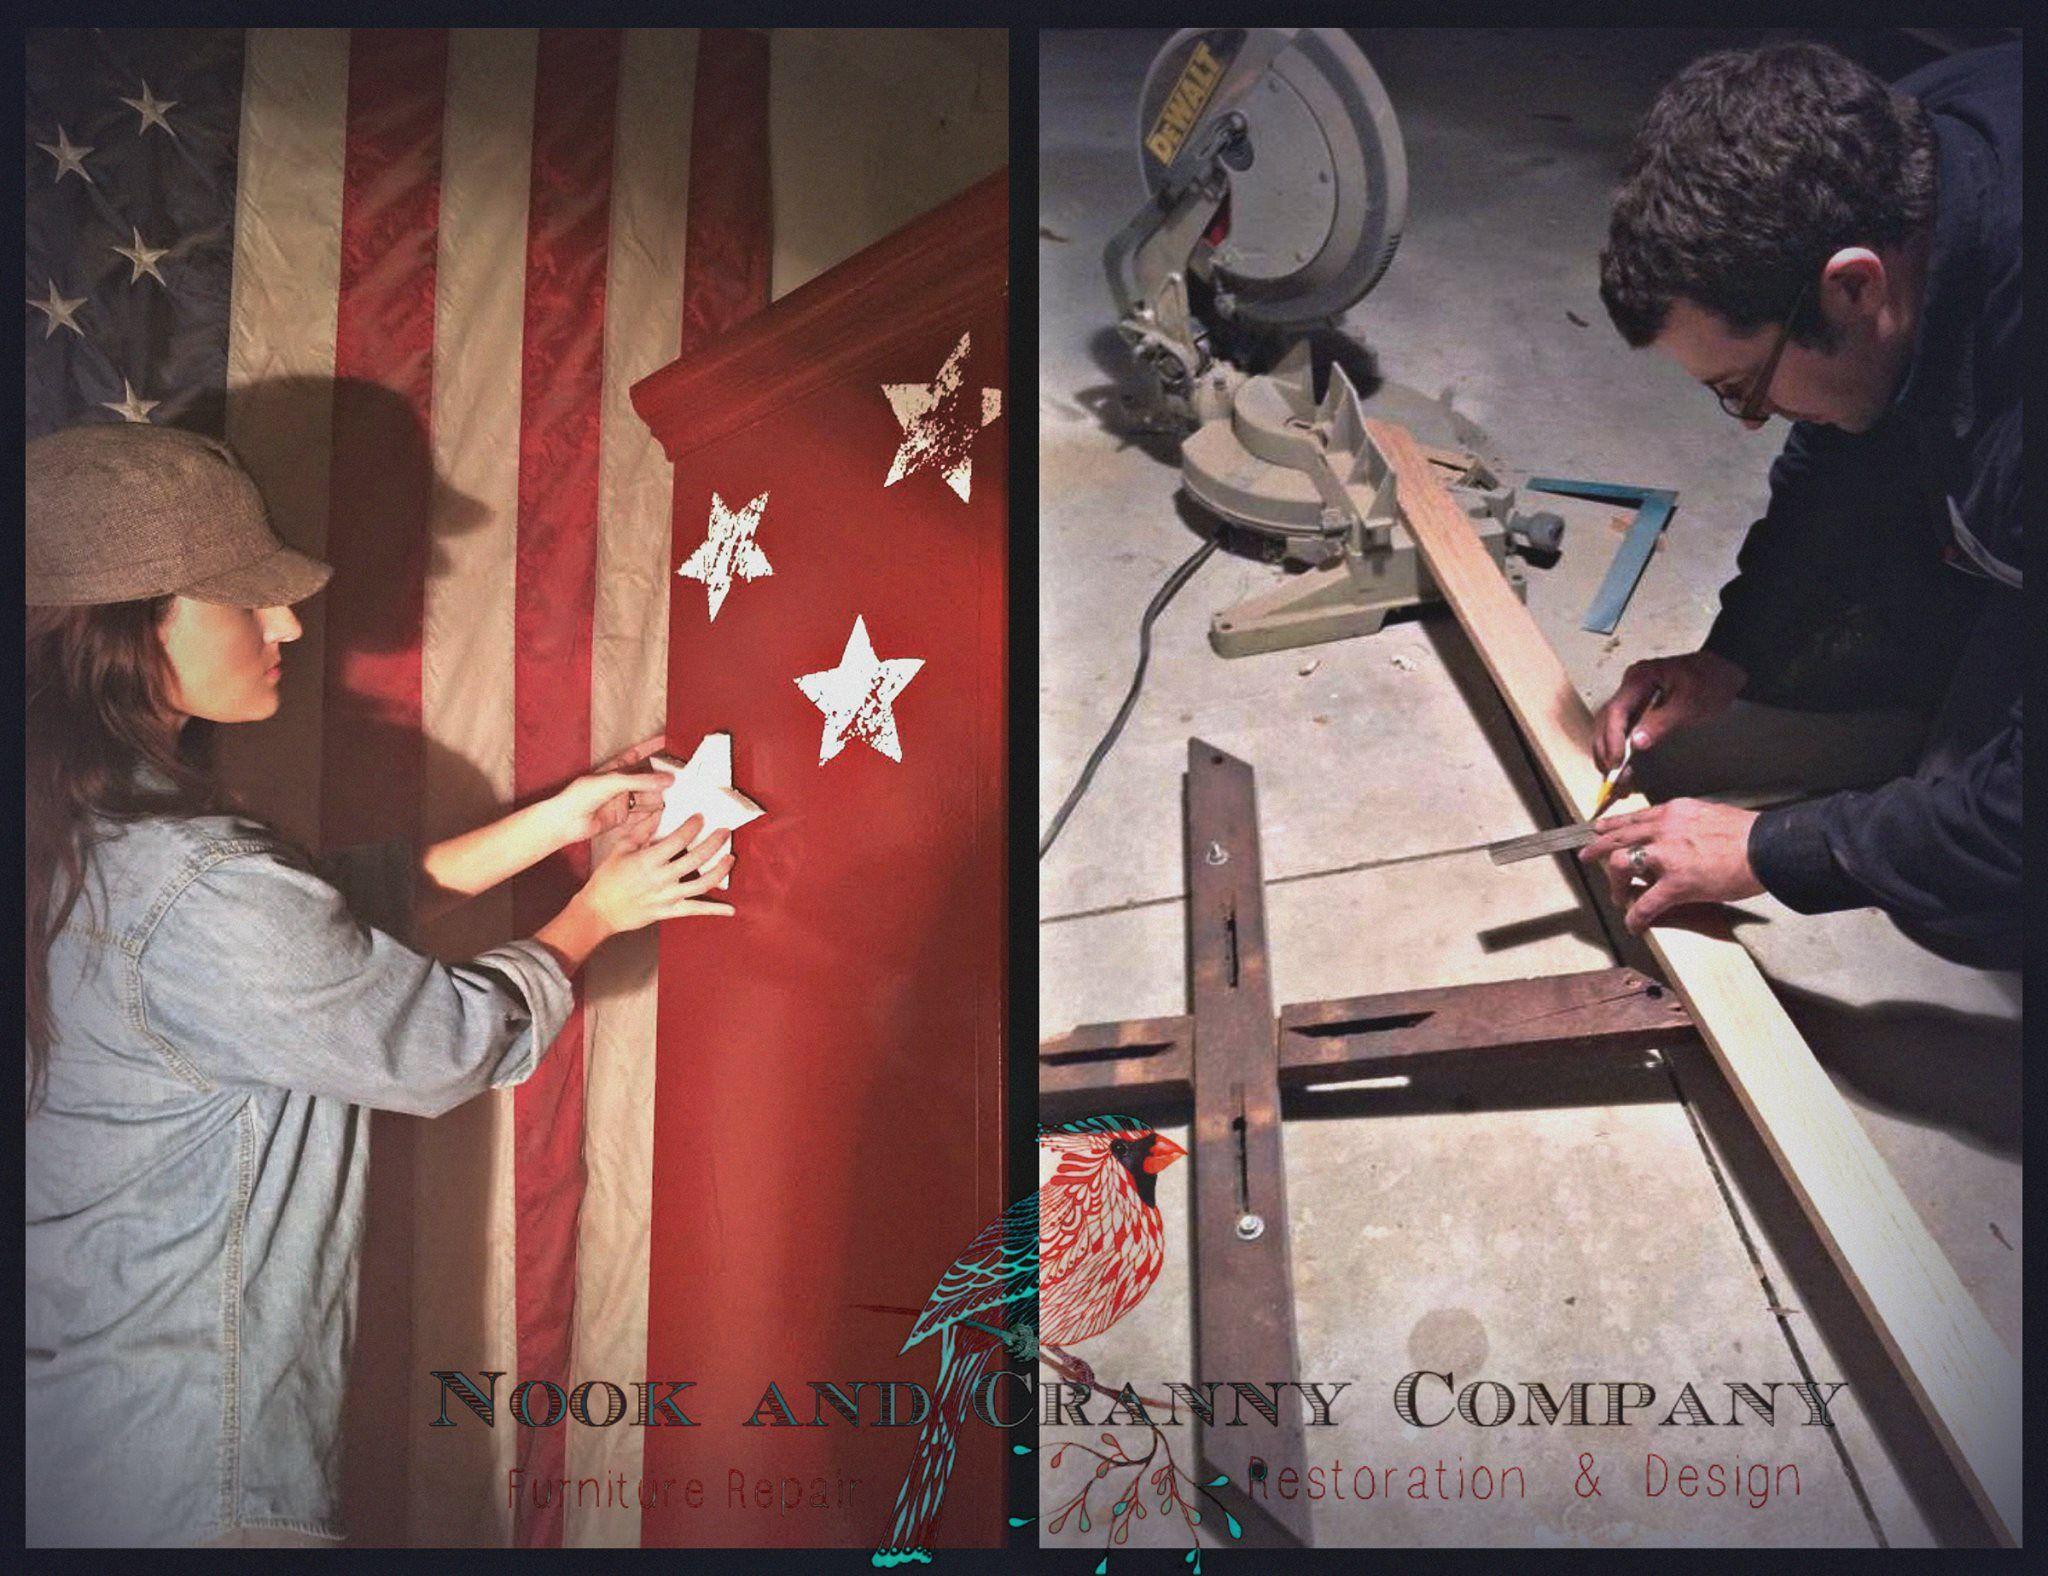 Pin On Nook And Cranny Co Furniture Repair Furniture Restoration Furniture Refinishing Spartanburg Greenville Sc